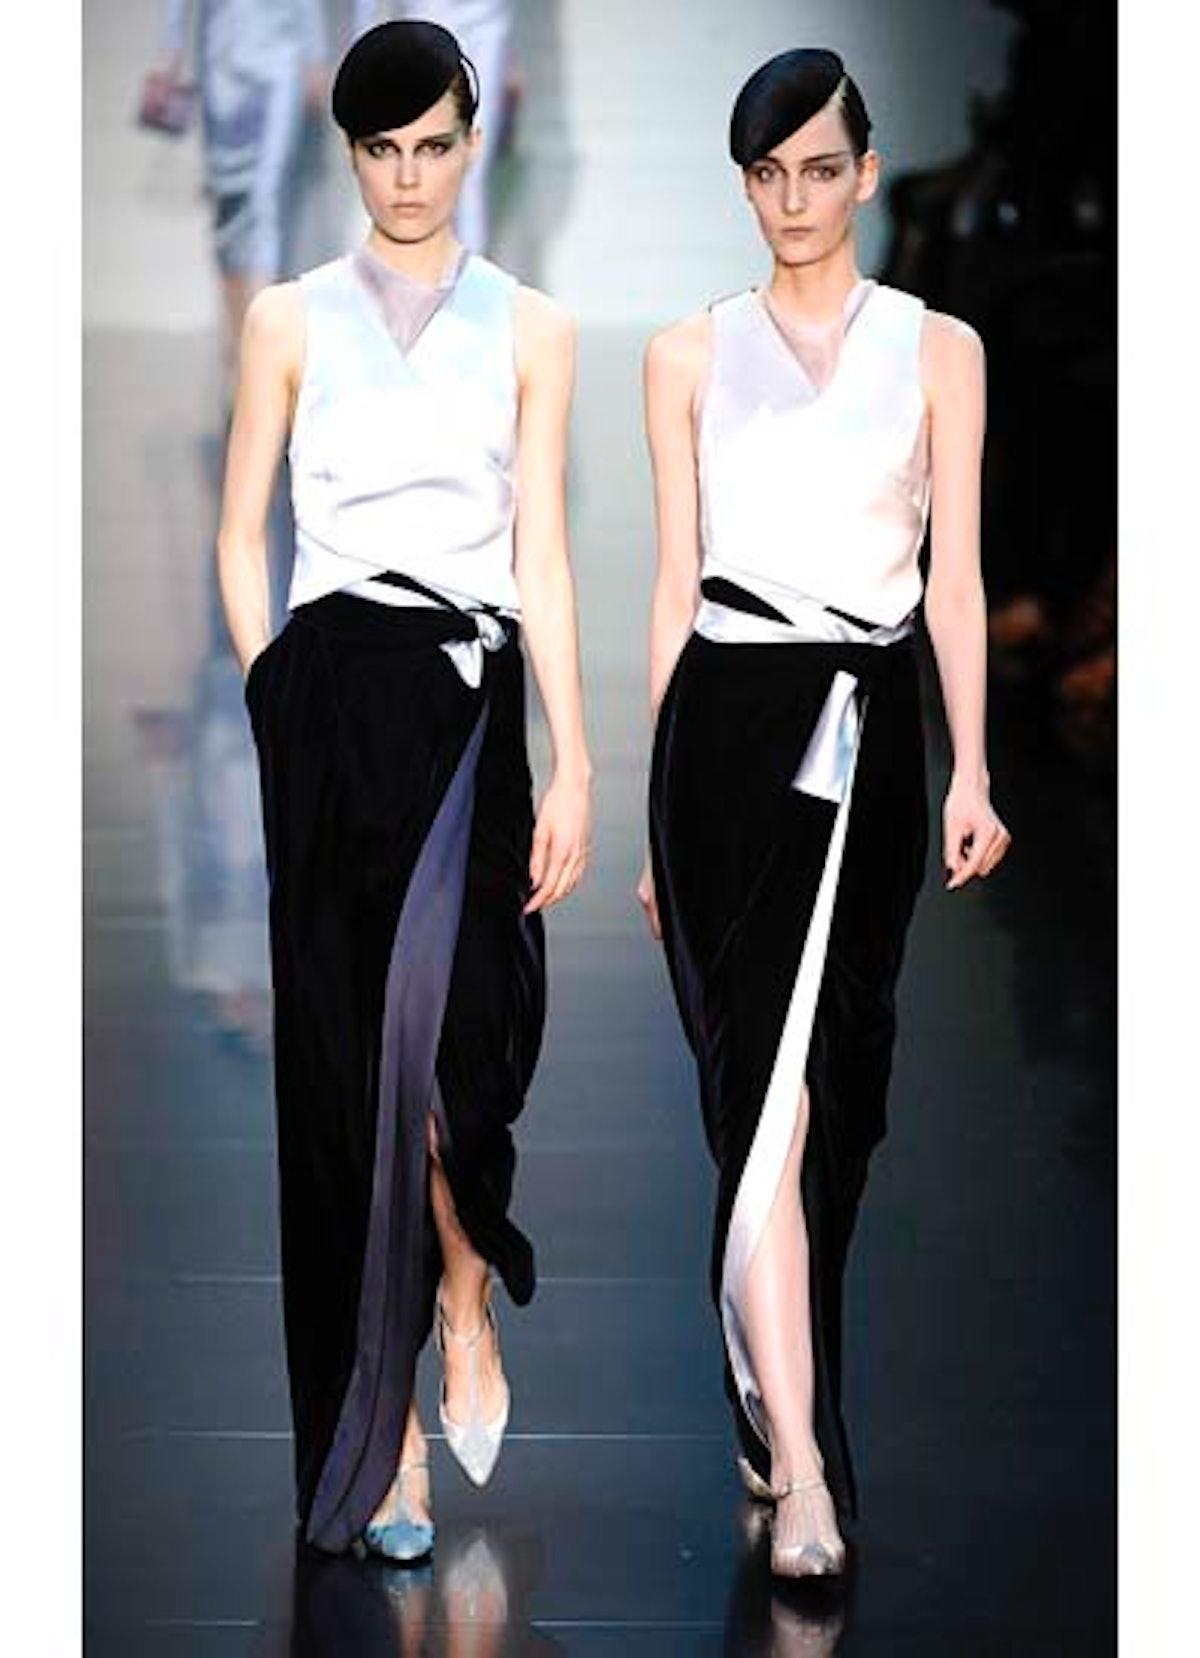 fass-giorgio-armani-couture-2012-runway-13-v.jpg